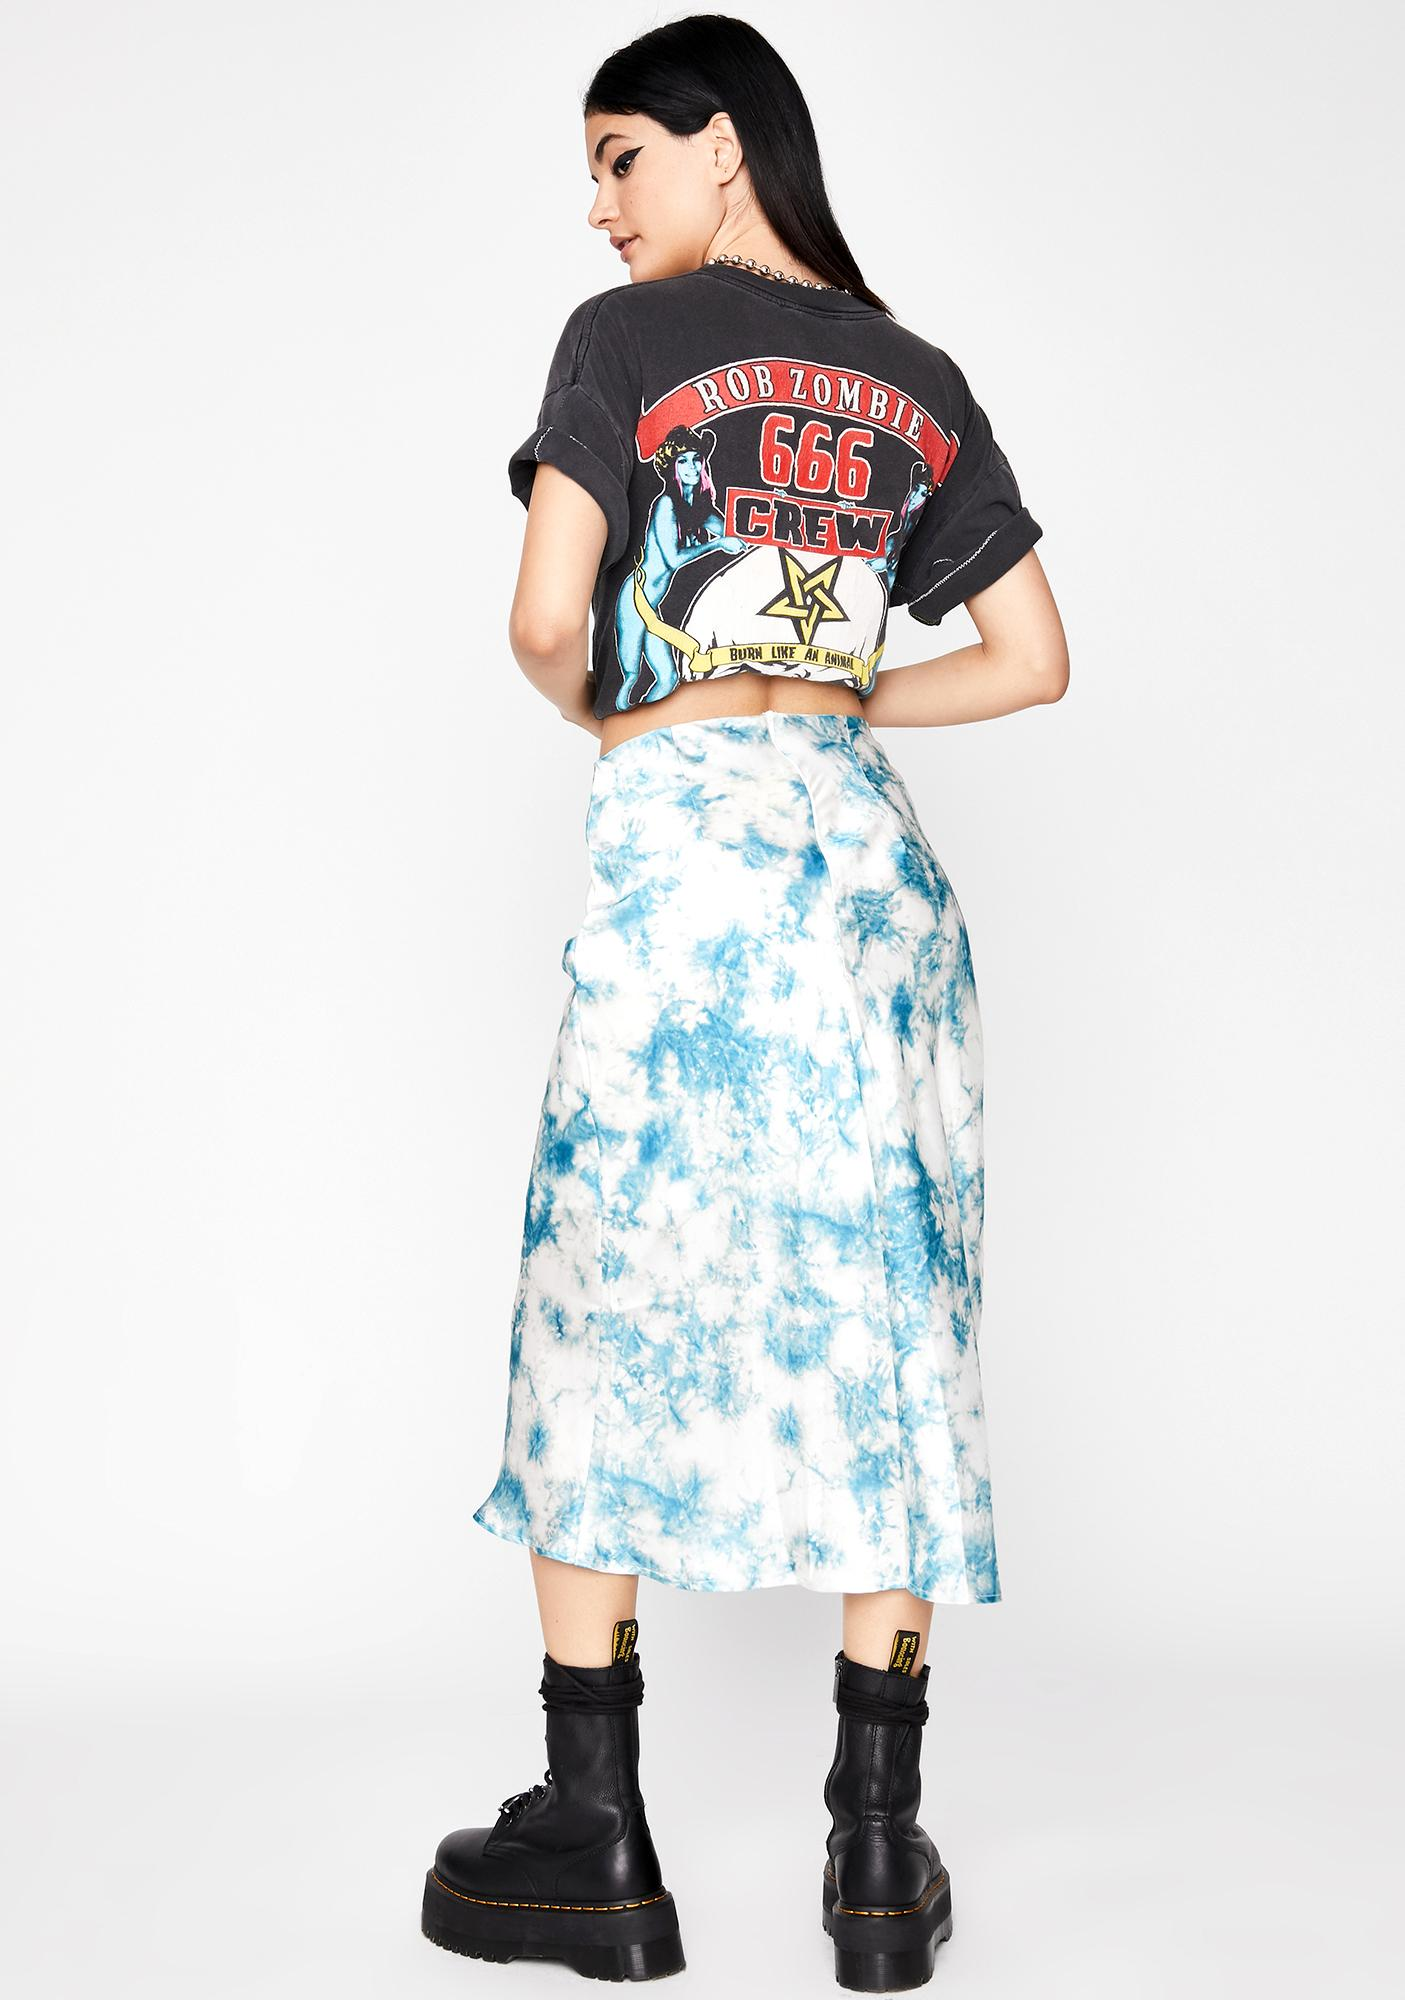 Cotton Candy Skies Midi Skirt